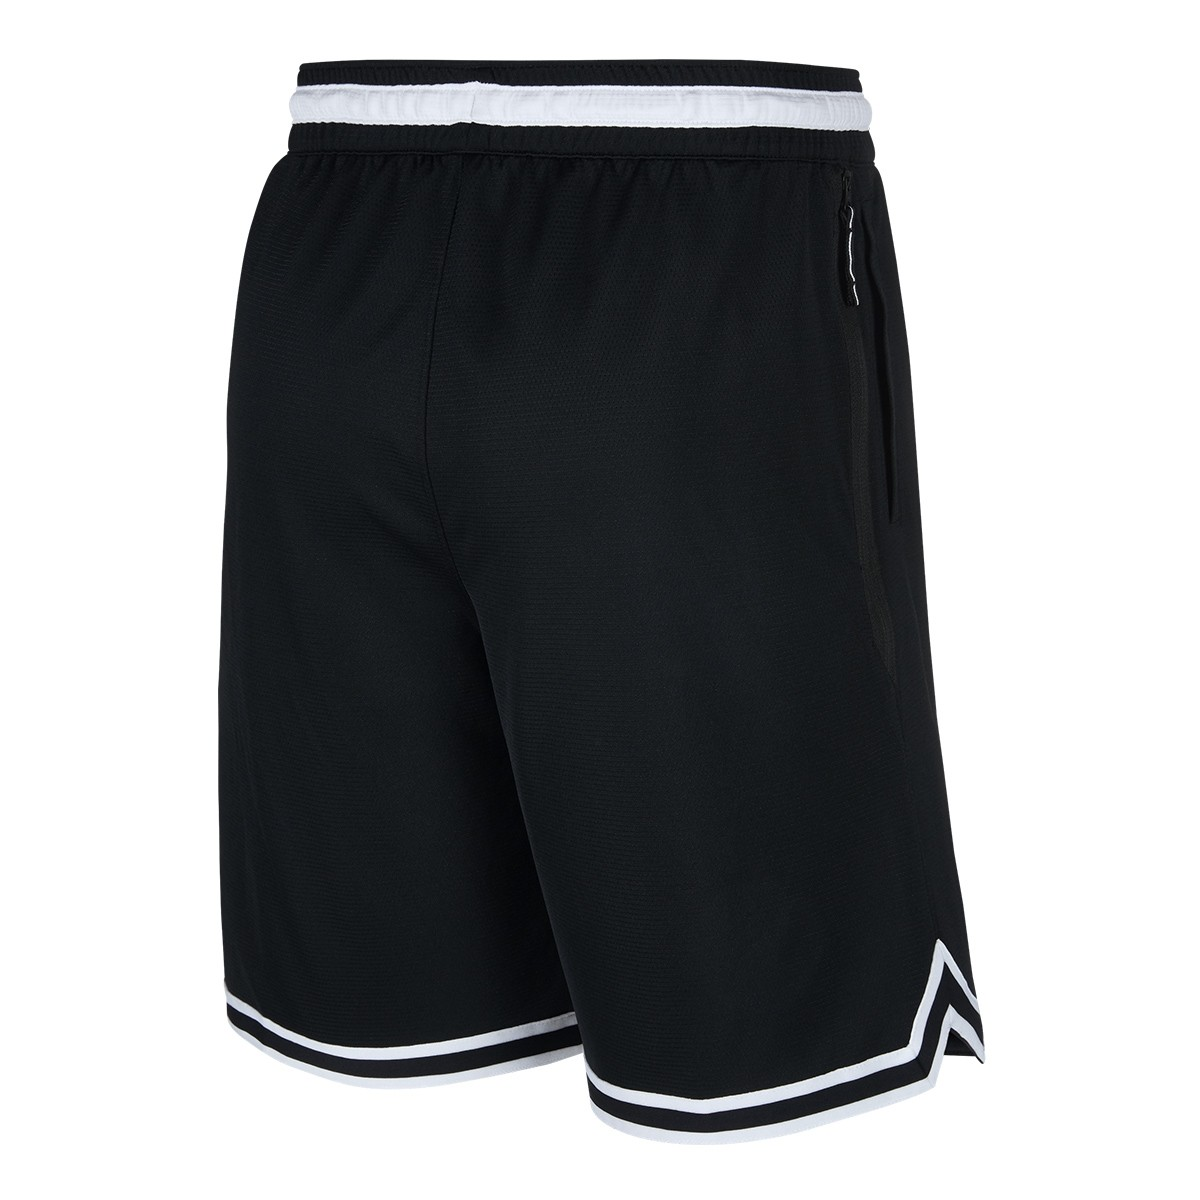 Nike Dri-FIT DNA 'Black & White'-AT3150-010